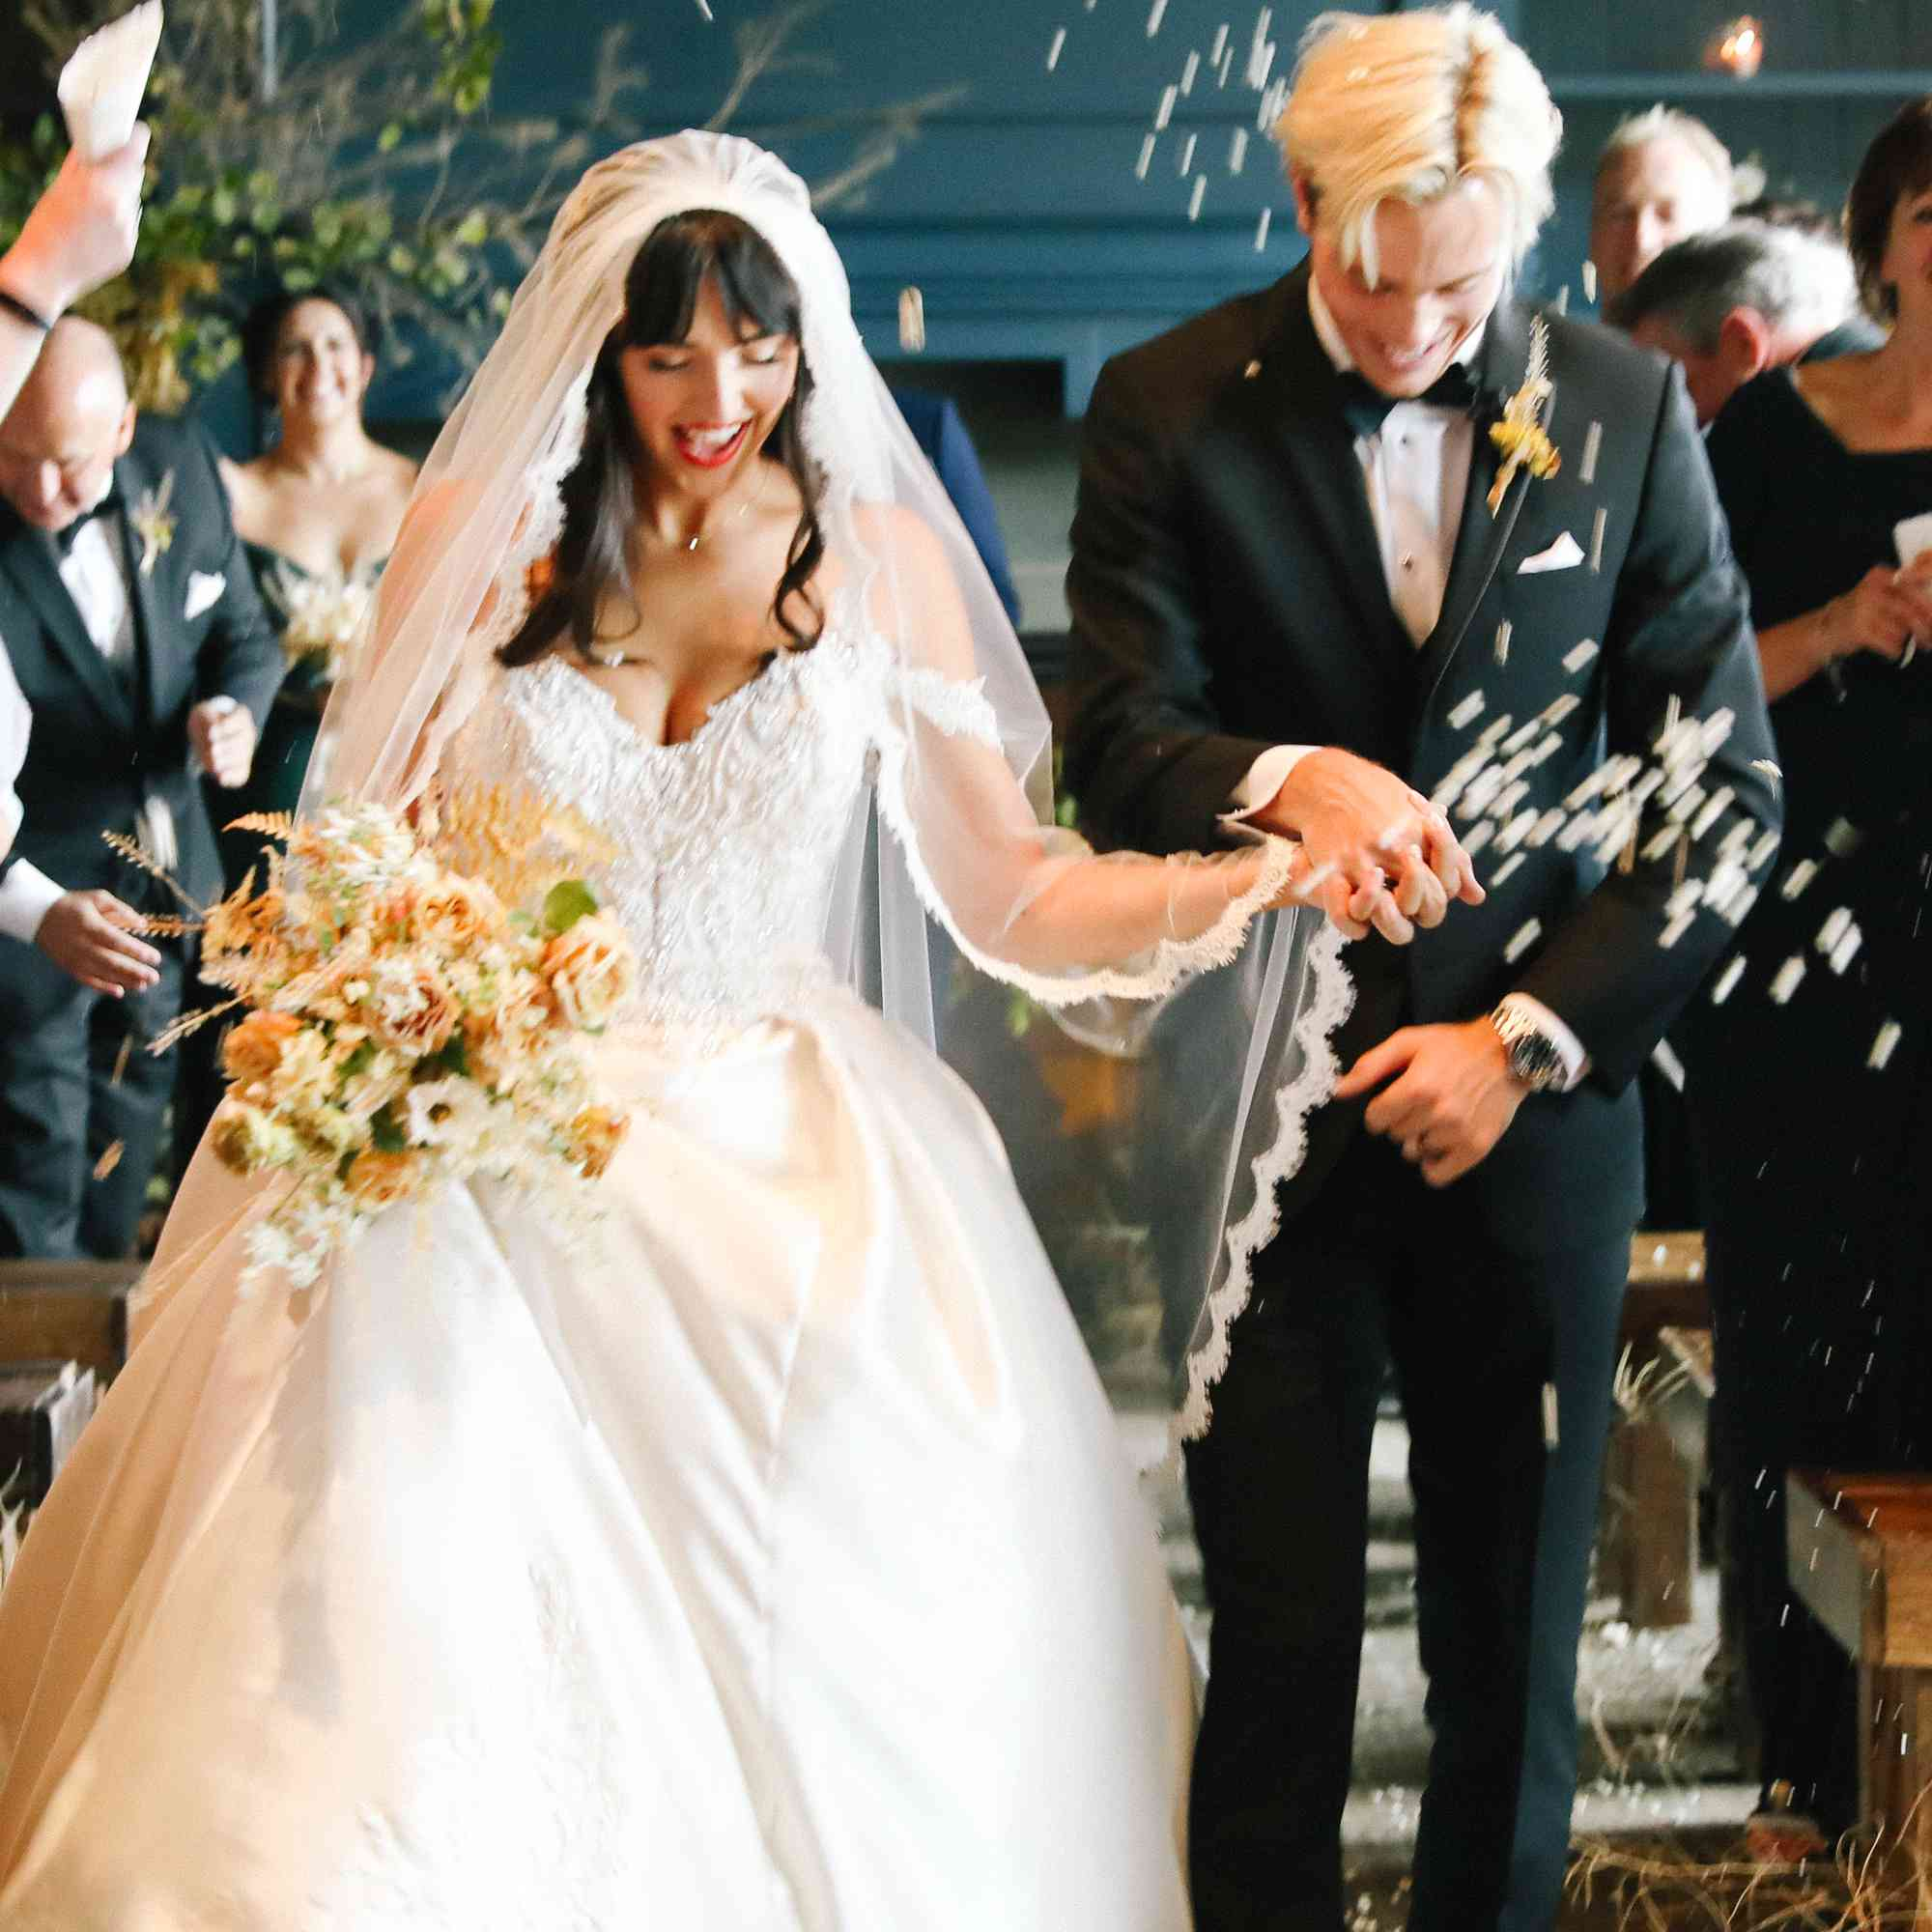 savannah and riker wedding, recessional